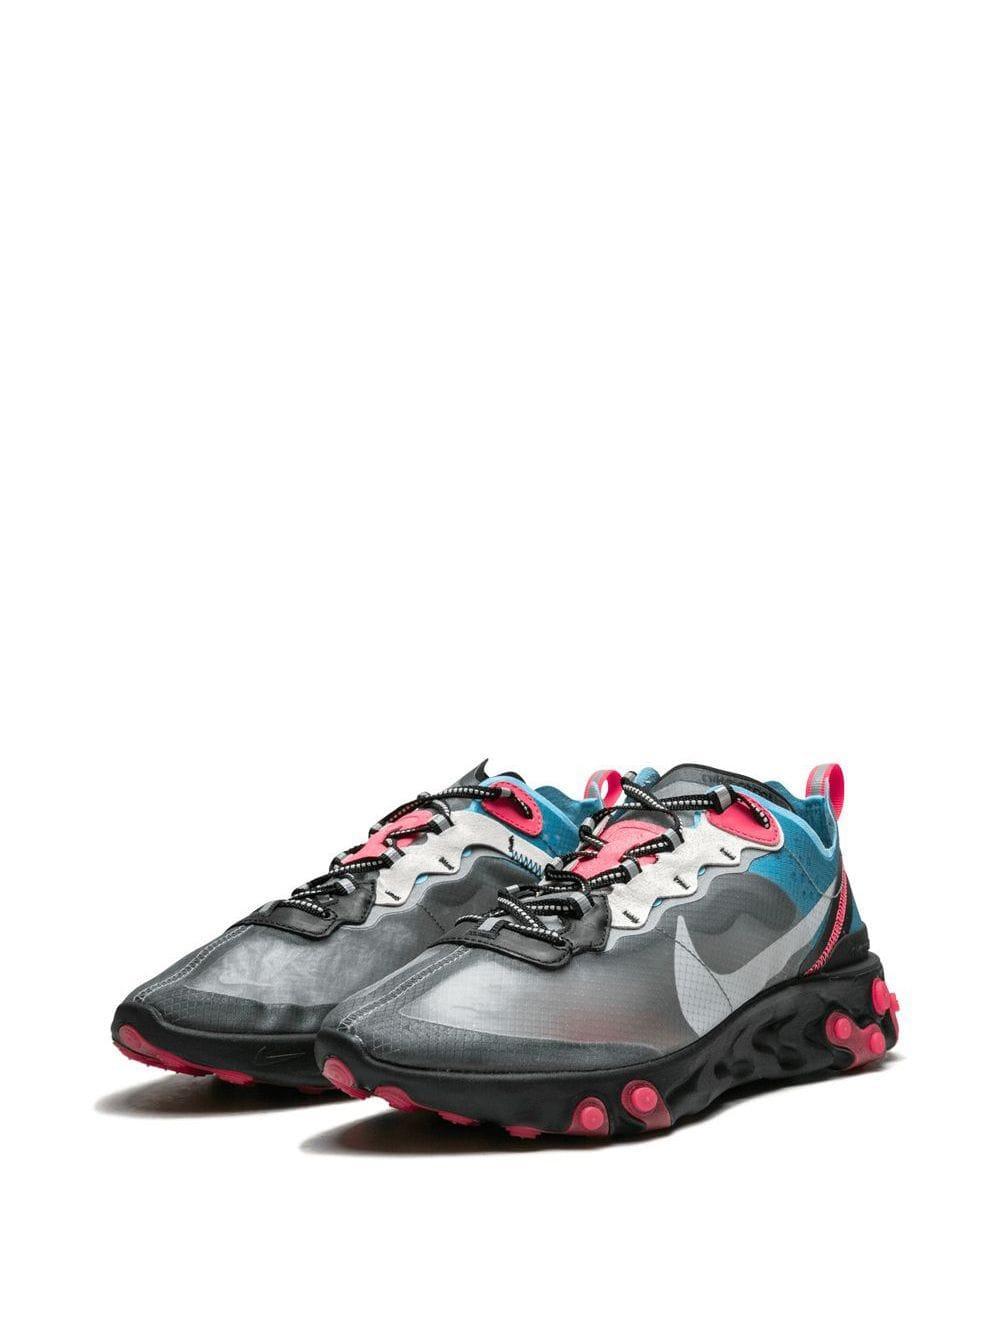 Zapatillas React Element 87 Nike de Tejido sintético de color Gris para hombre